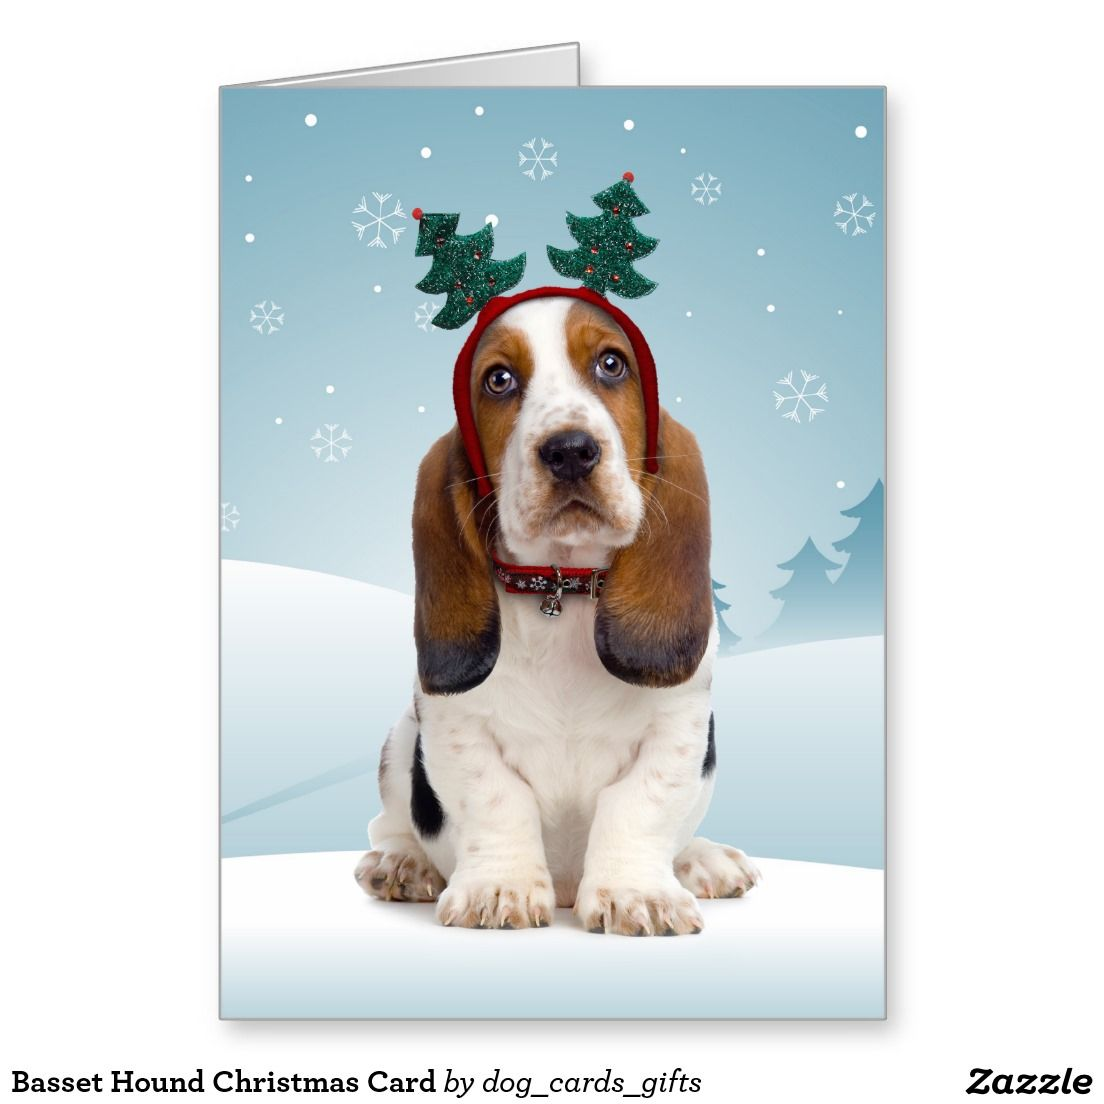 Basset Hound Christmas Card | Christmas Cards | Pinterest | Basset hound